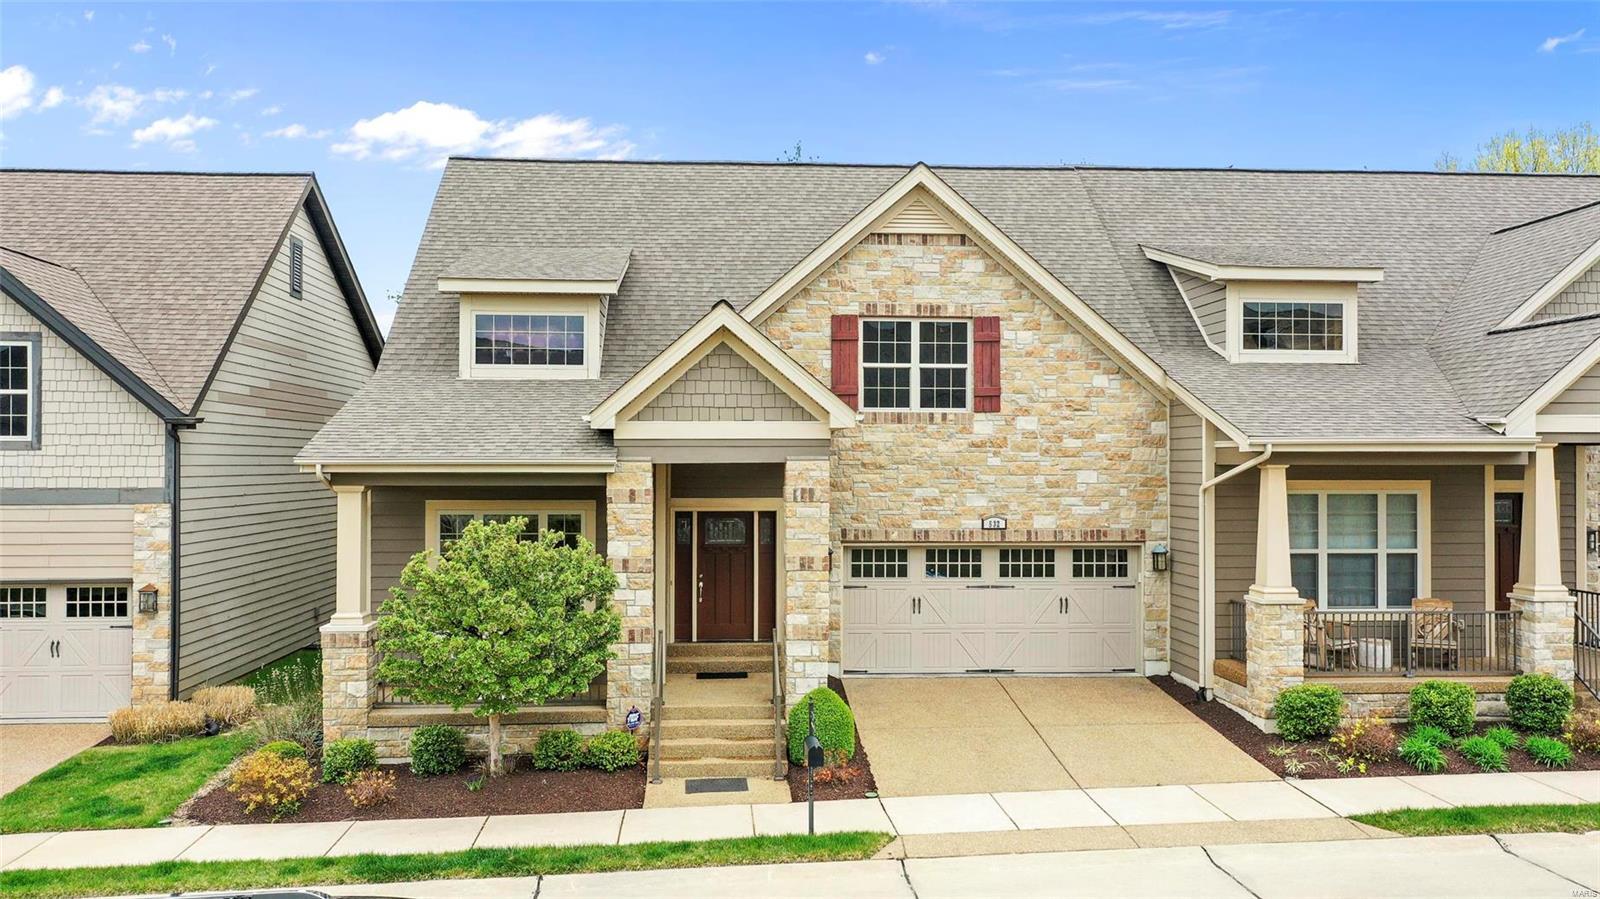 532 Trevi Lane Property Photo - Ballwin, MO real estate listing